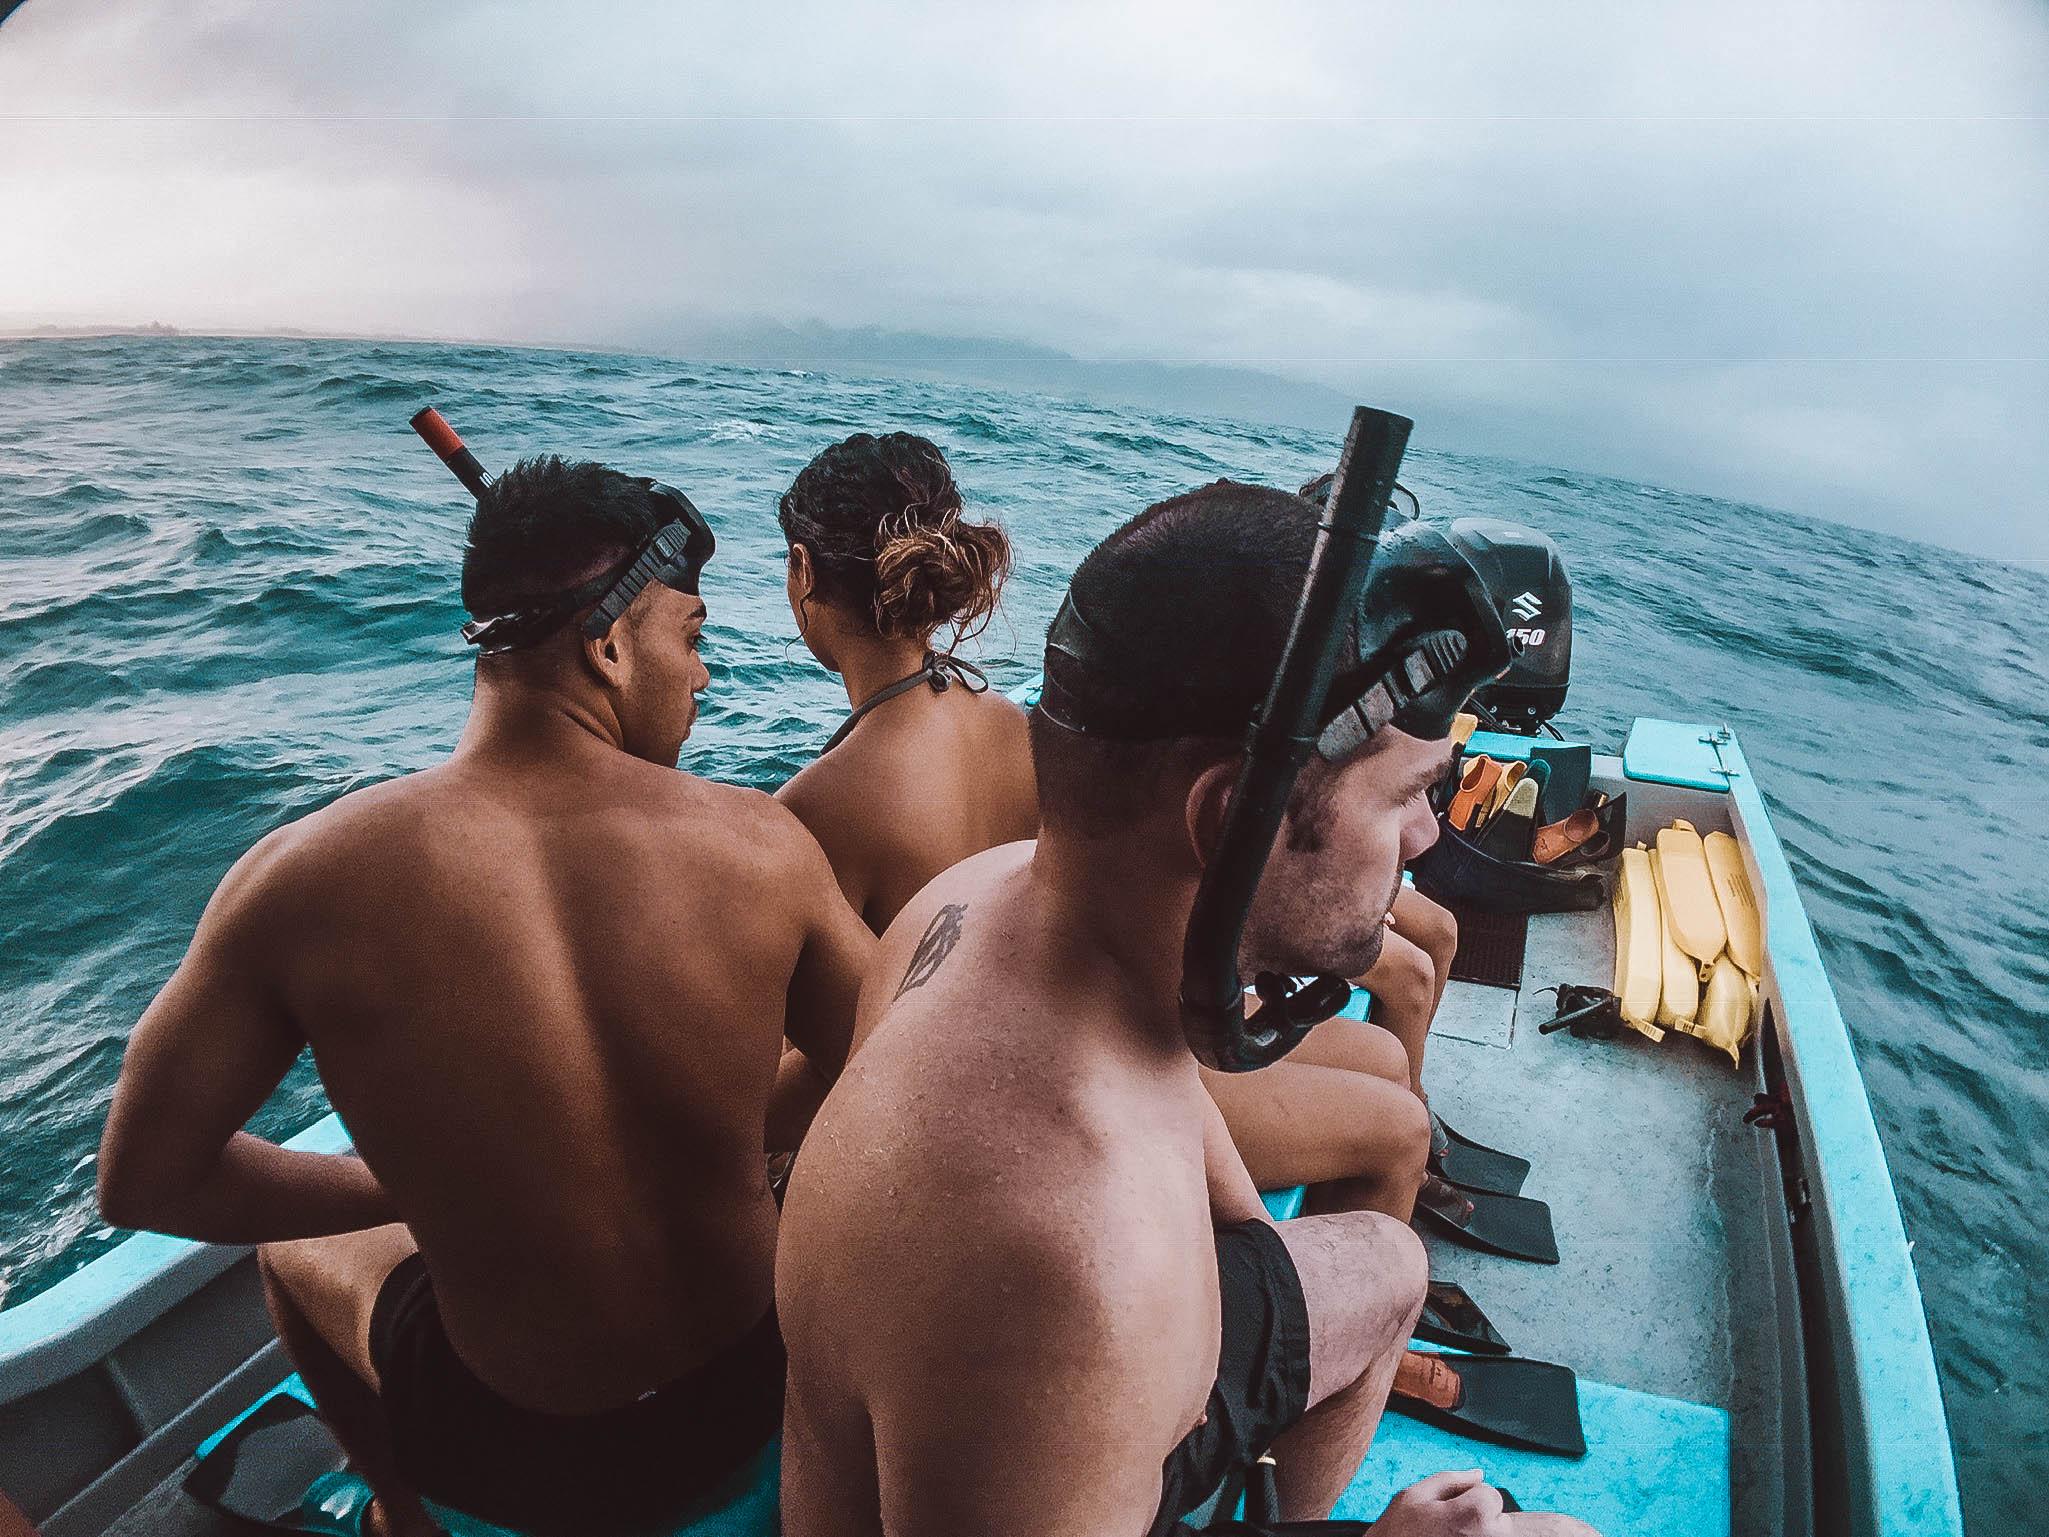 Photo: Island View Hawaii